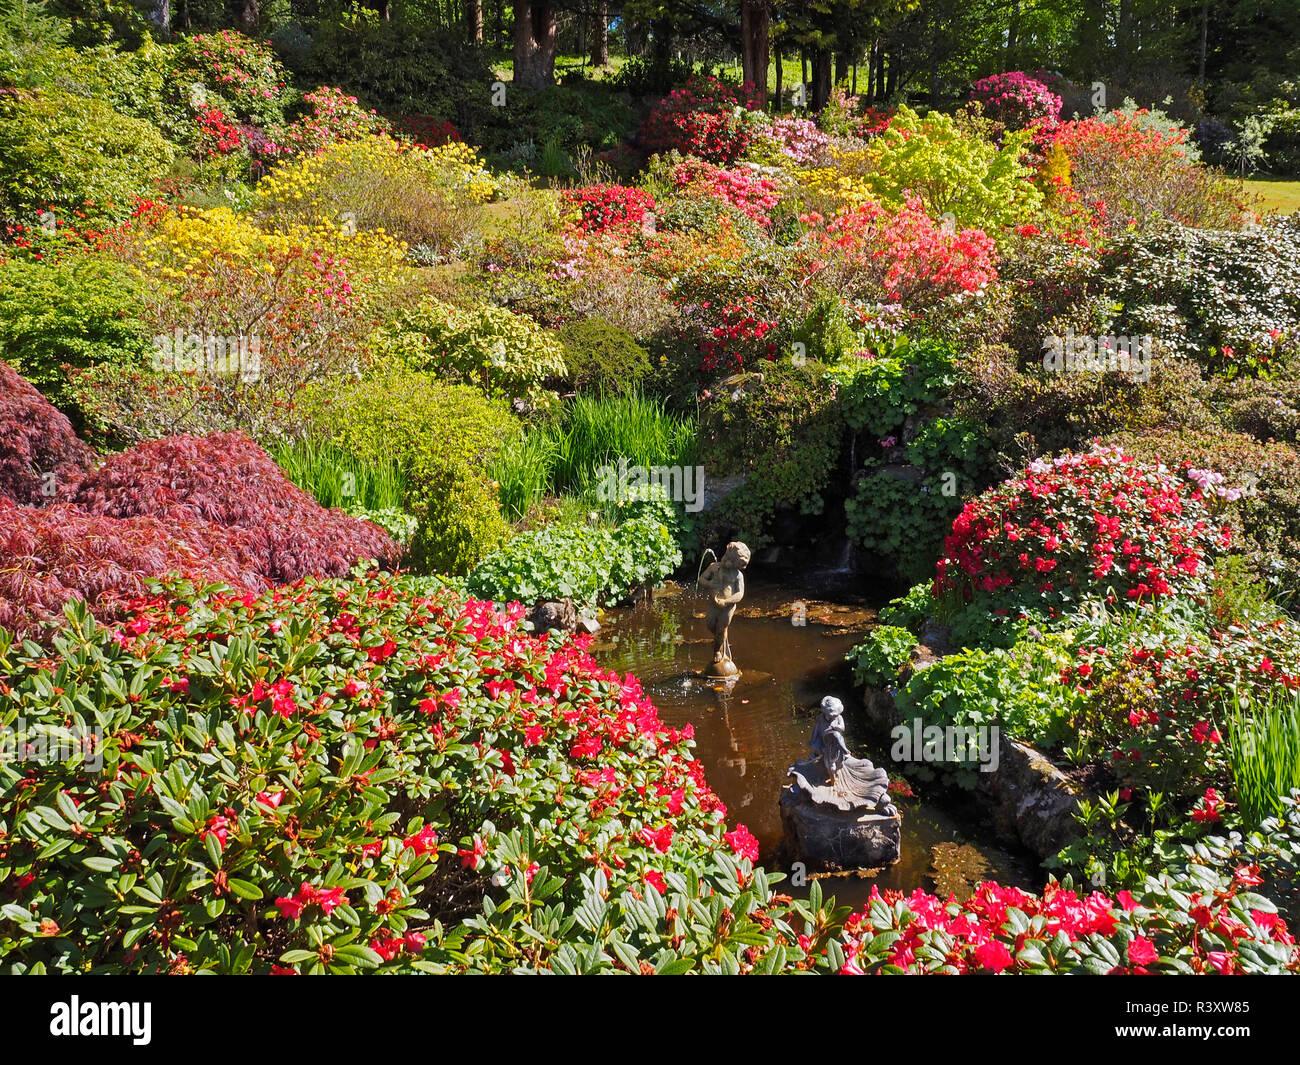 Ballindalloch Castle and gardens Scottish Highlands - Stock Image